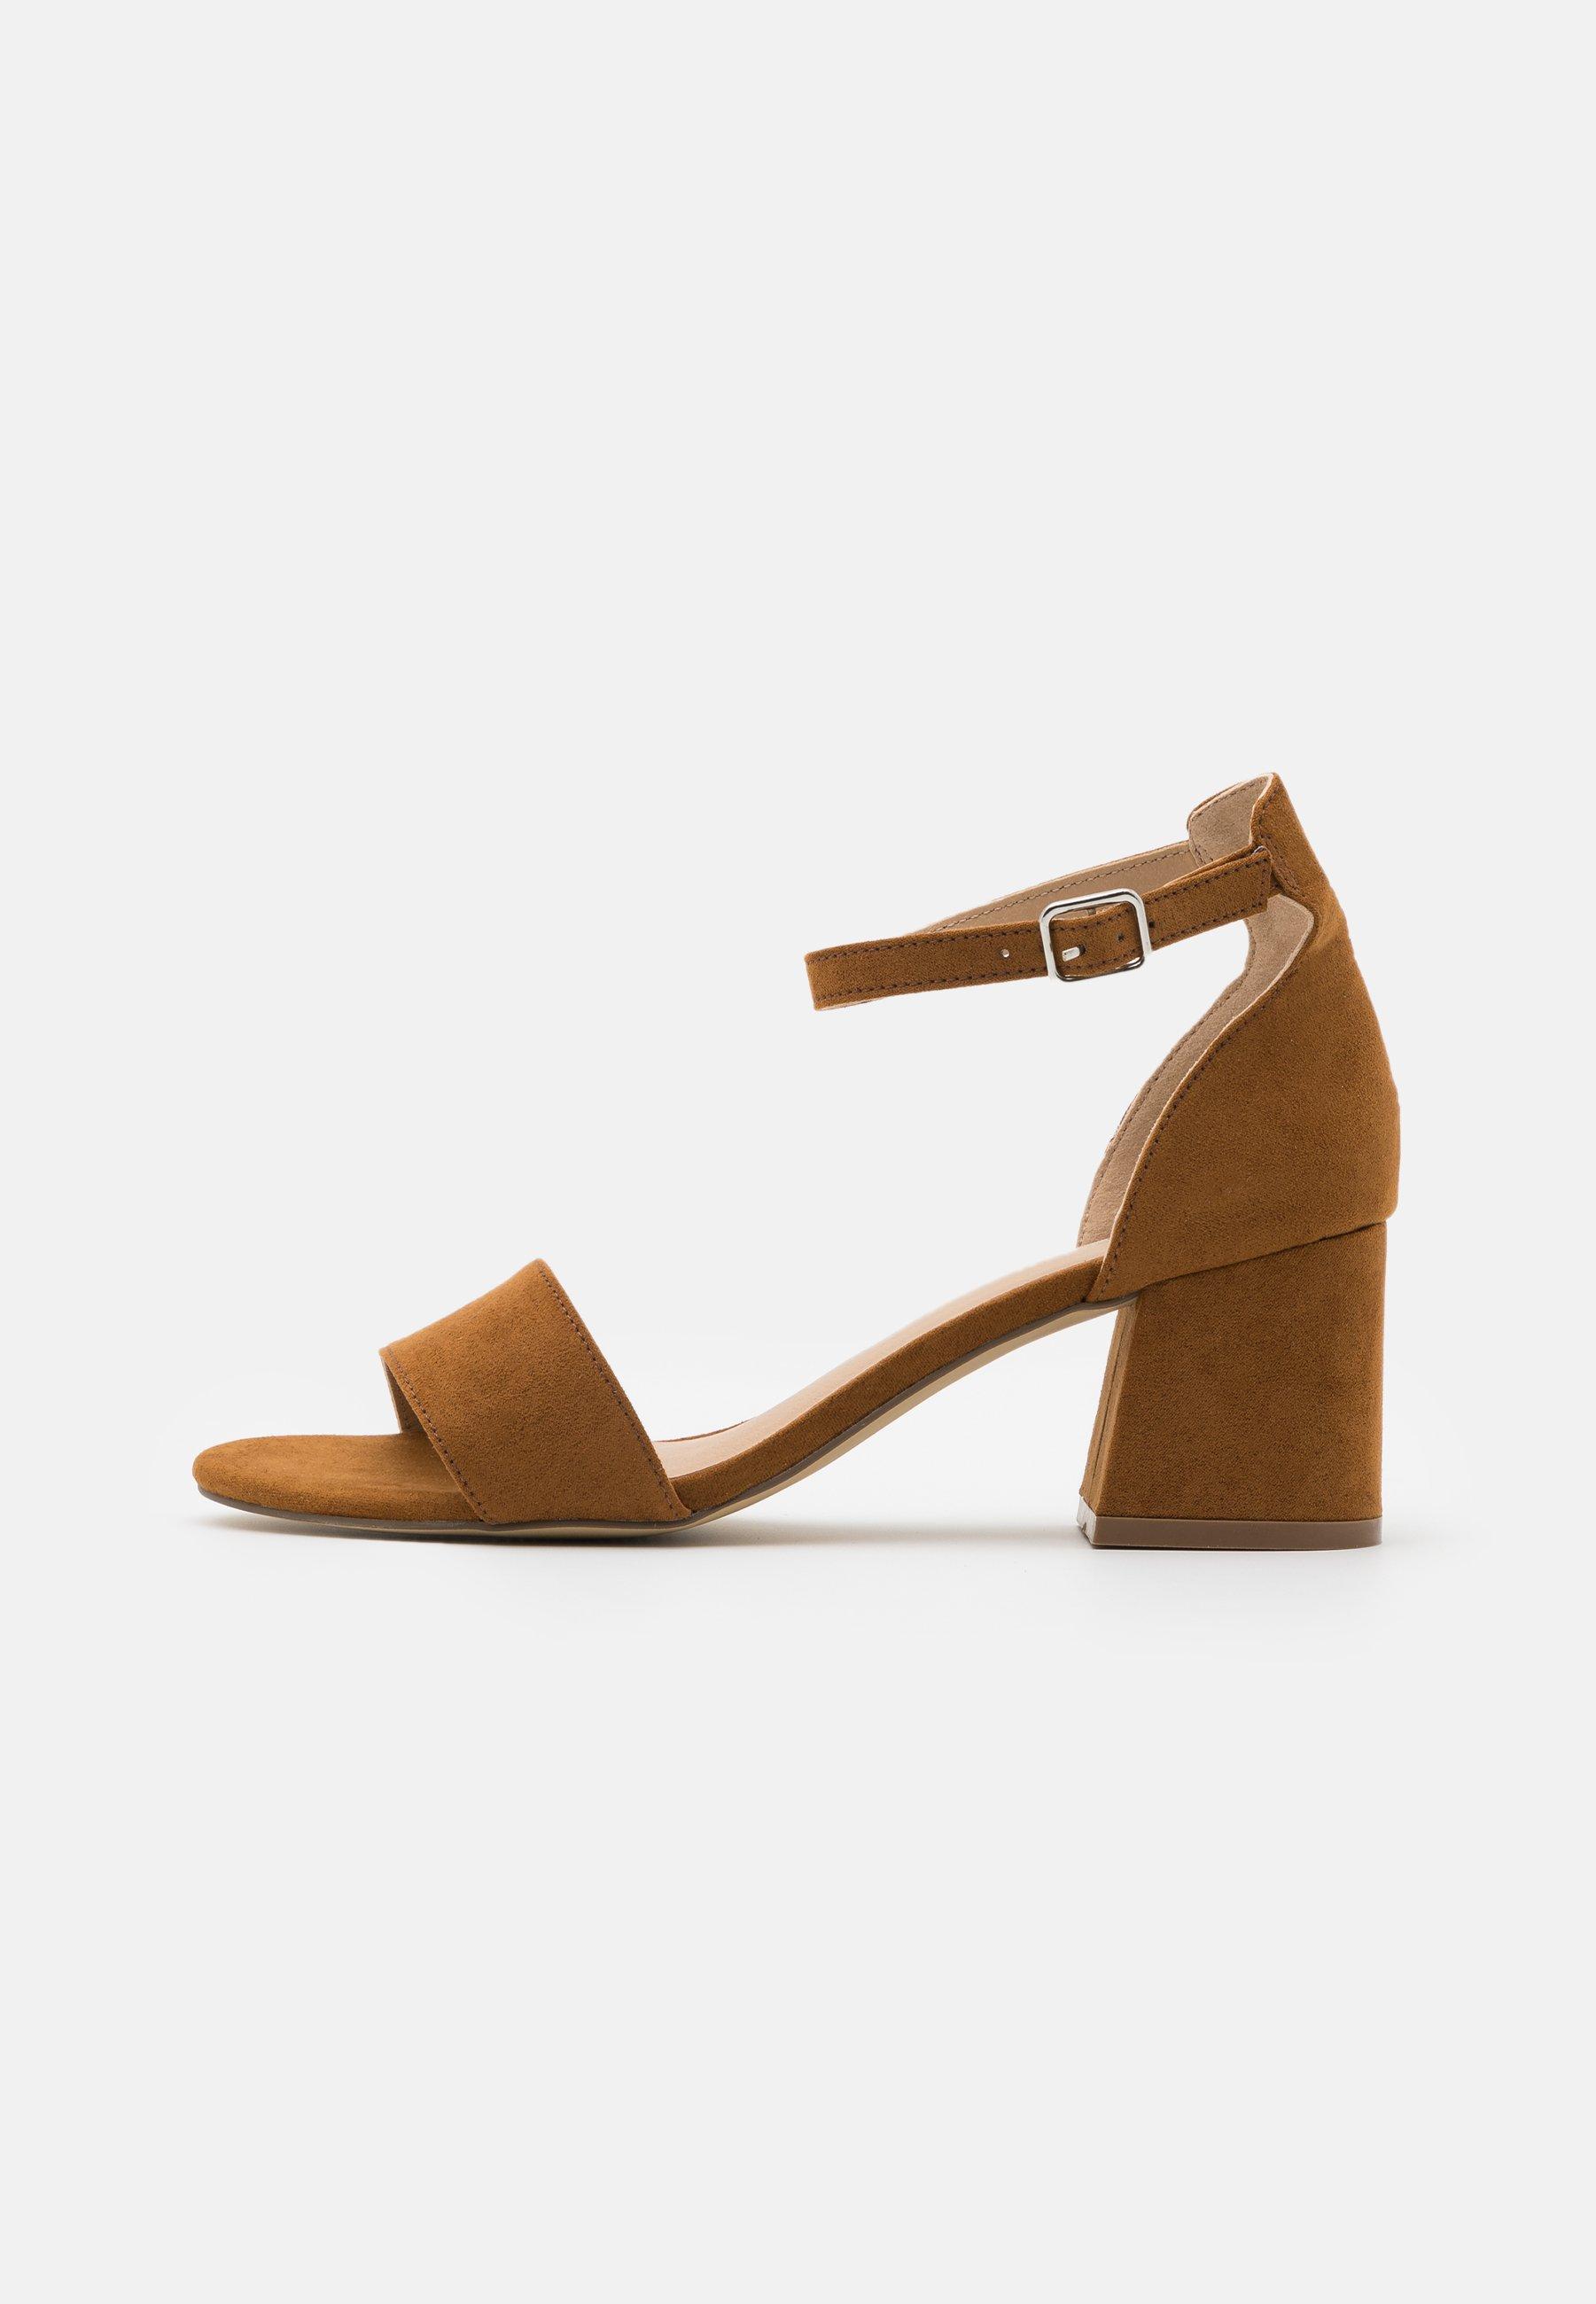 Bullboxer Sko | Dame | Nye sko på nett hos Zalando.no